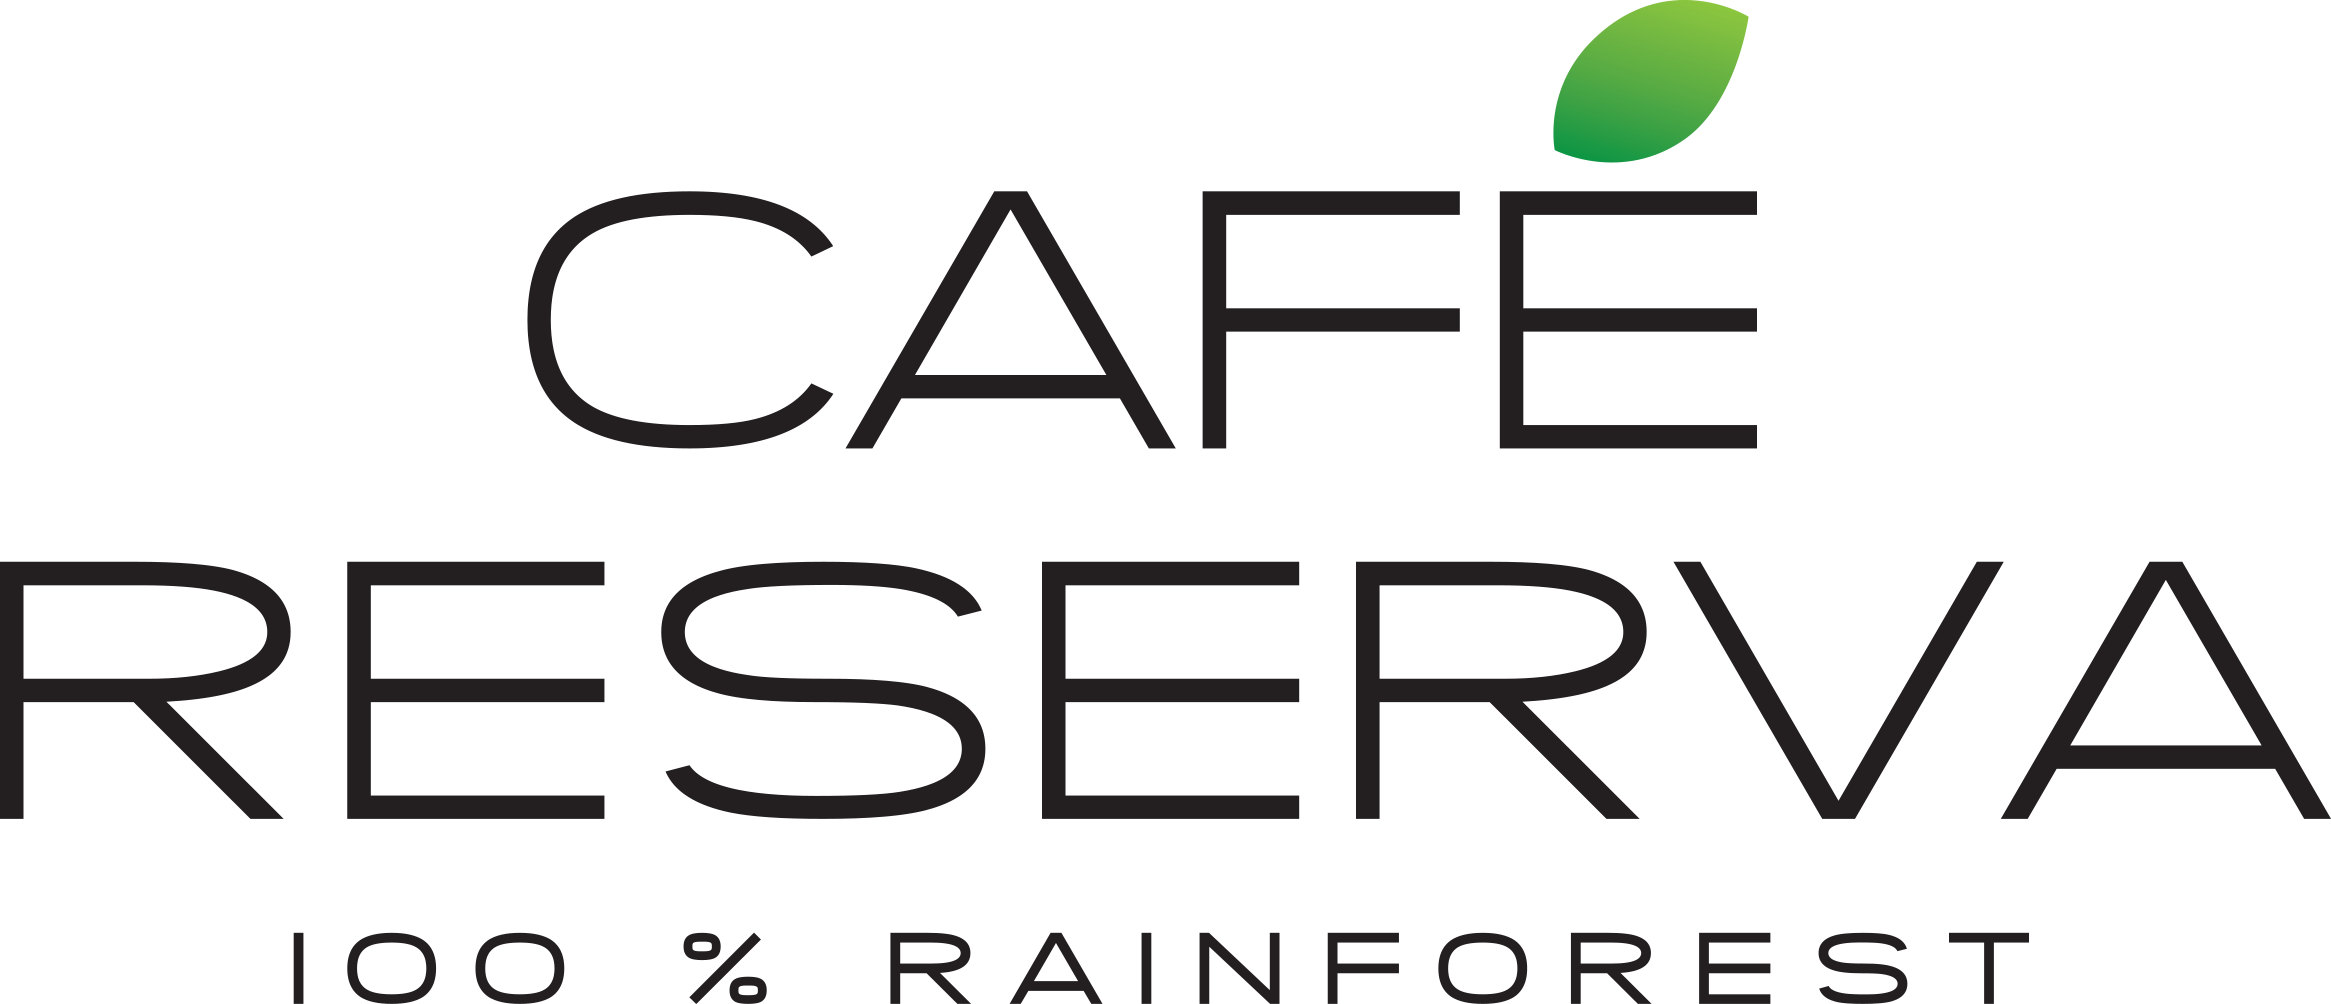 Café Reserva